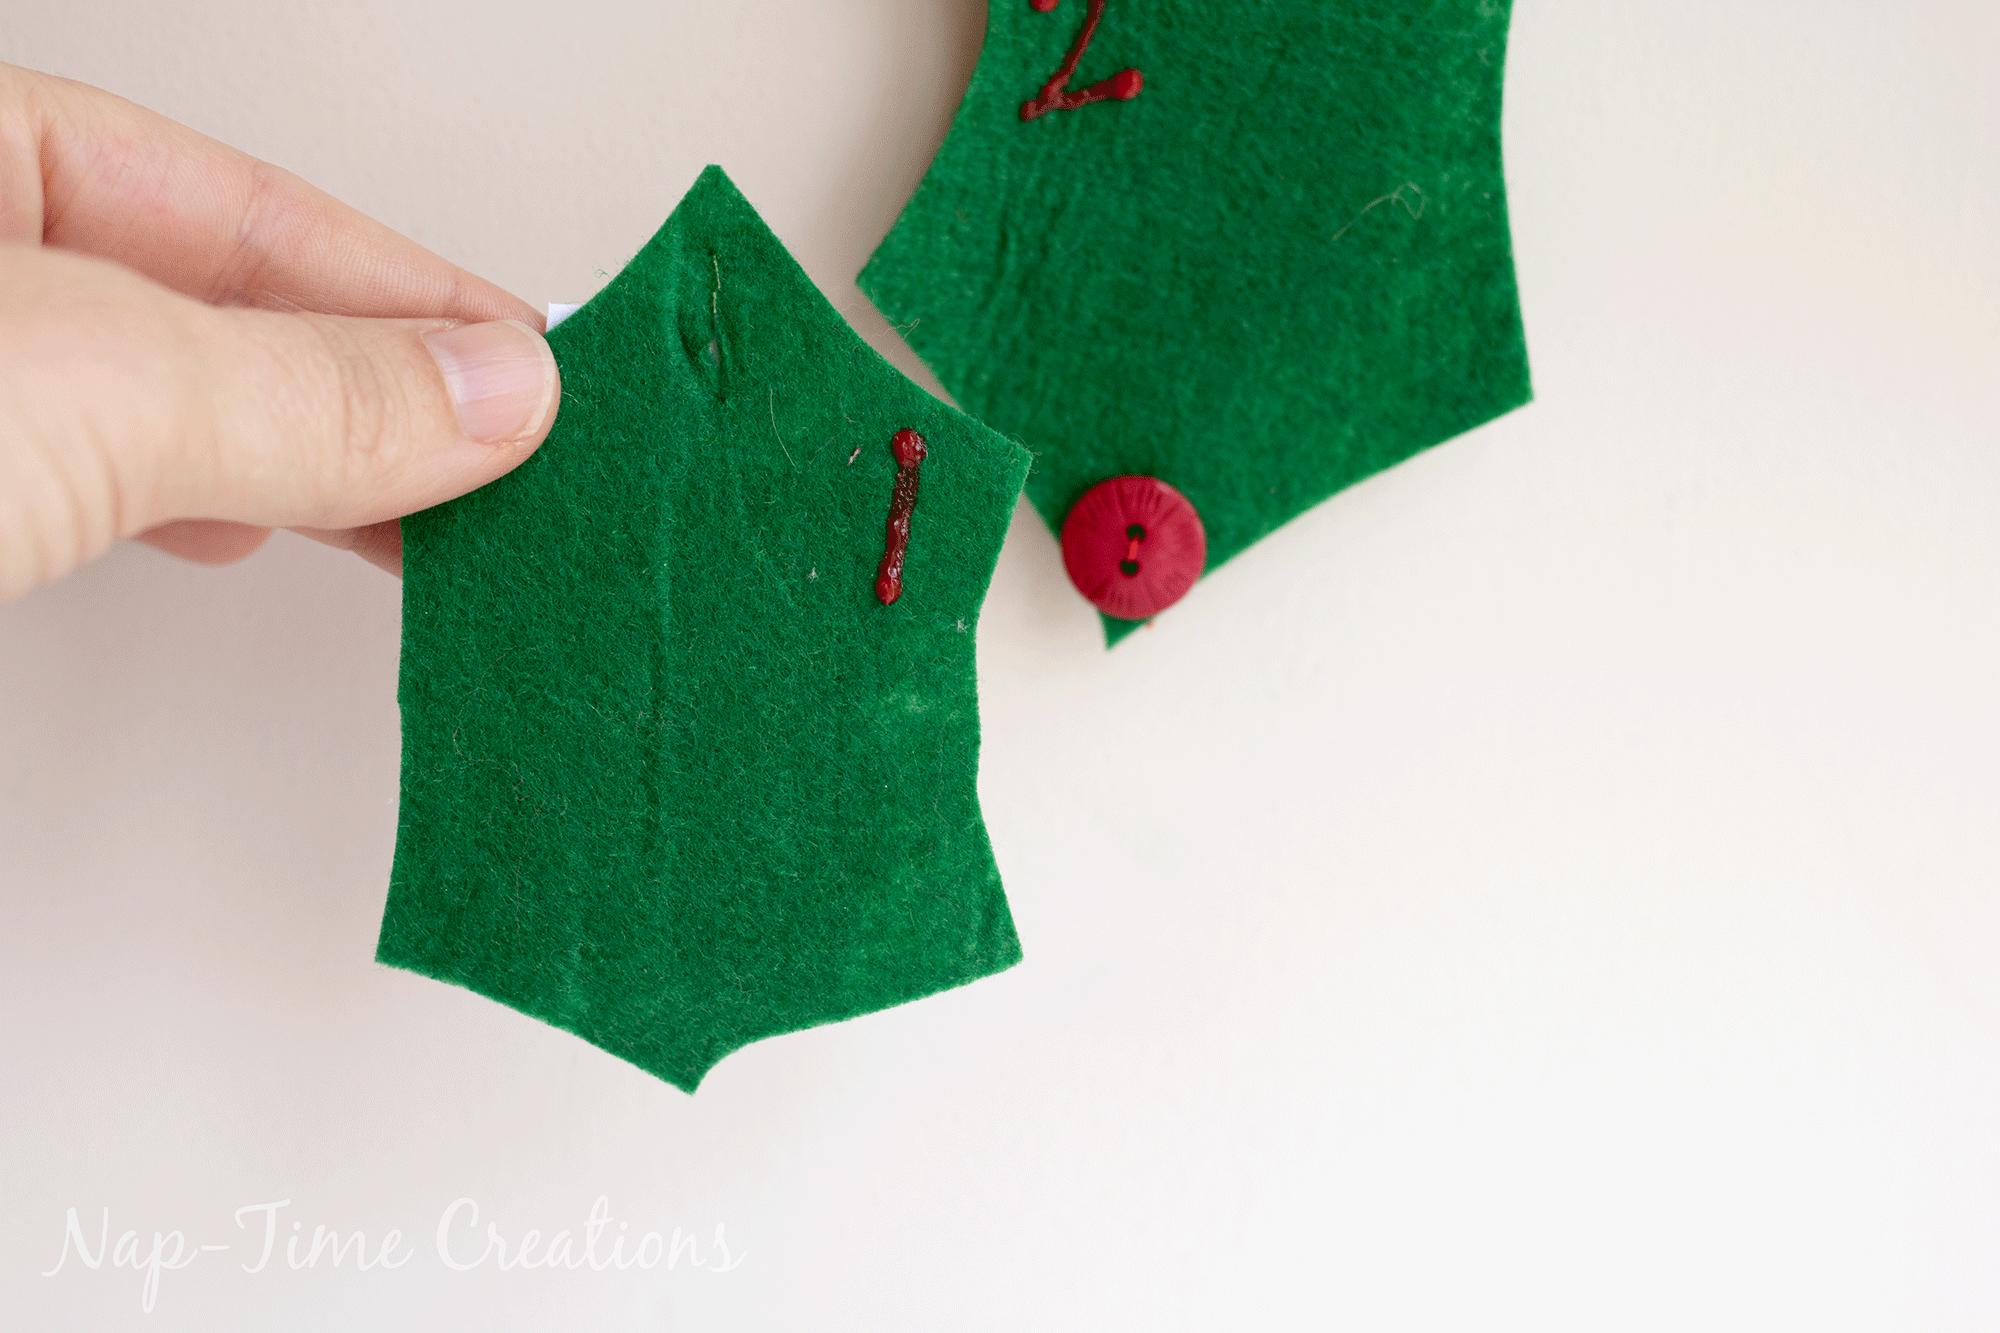 holly-jolly-christmas-countown-calendar-13